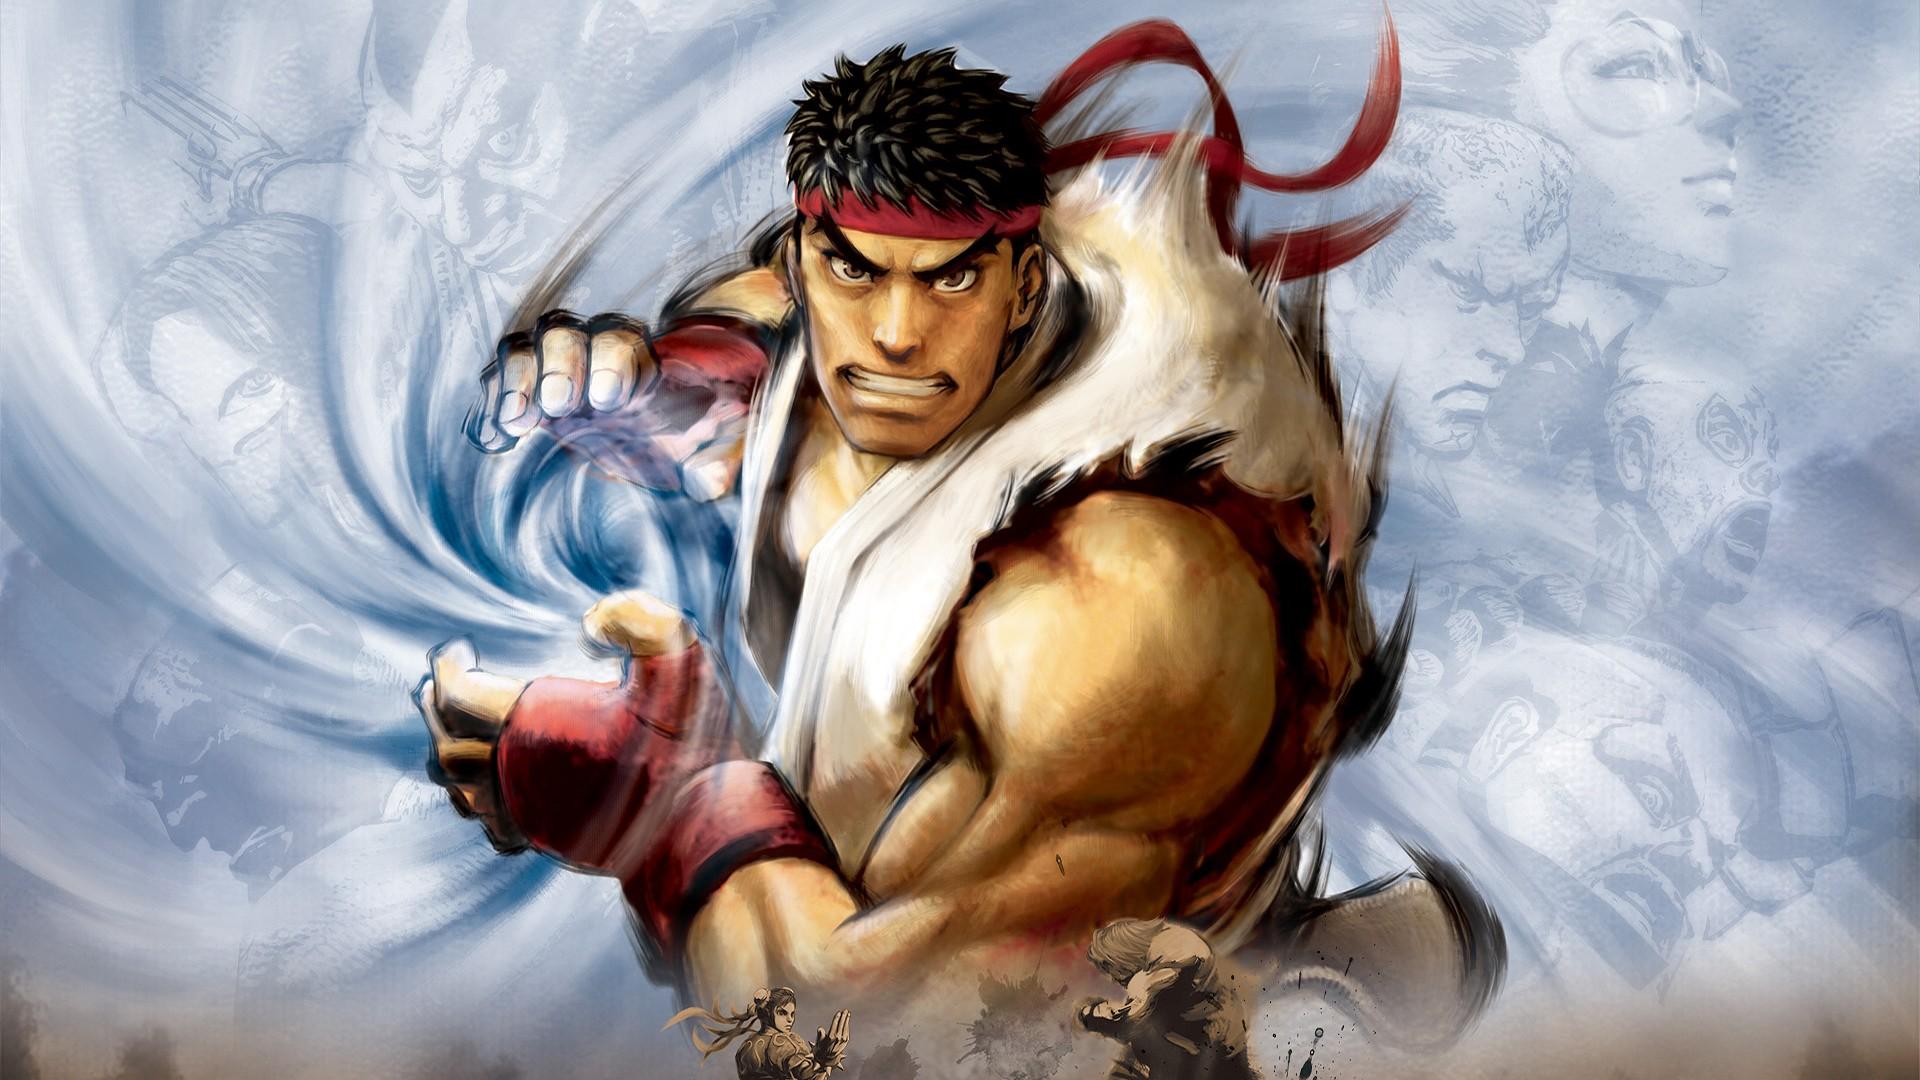 super street fighter iv arcade edition hd wallpaper background